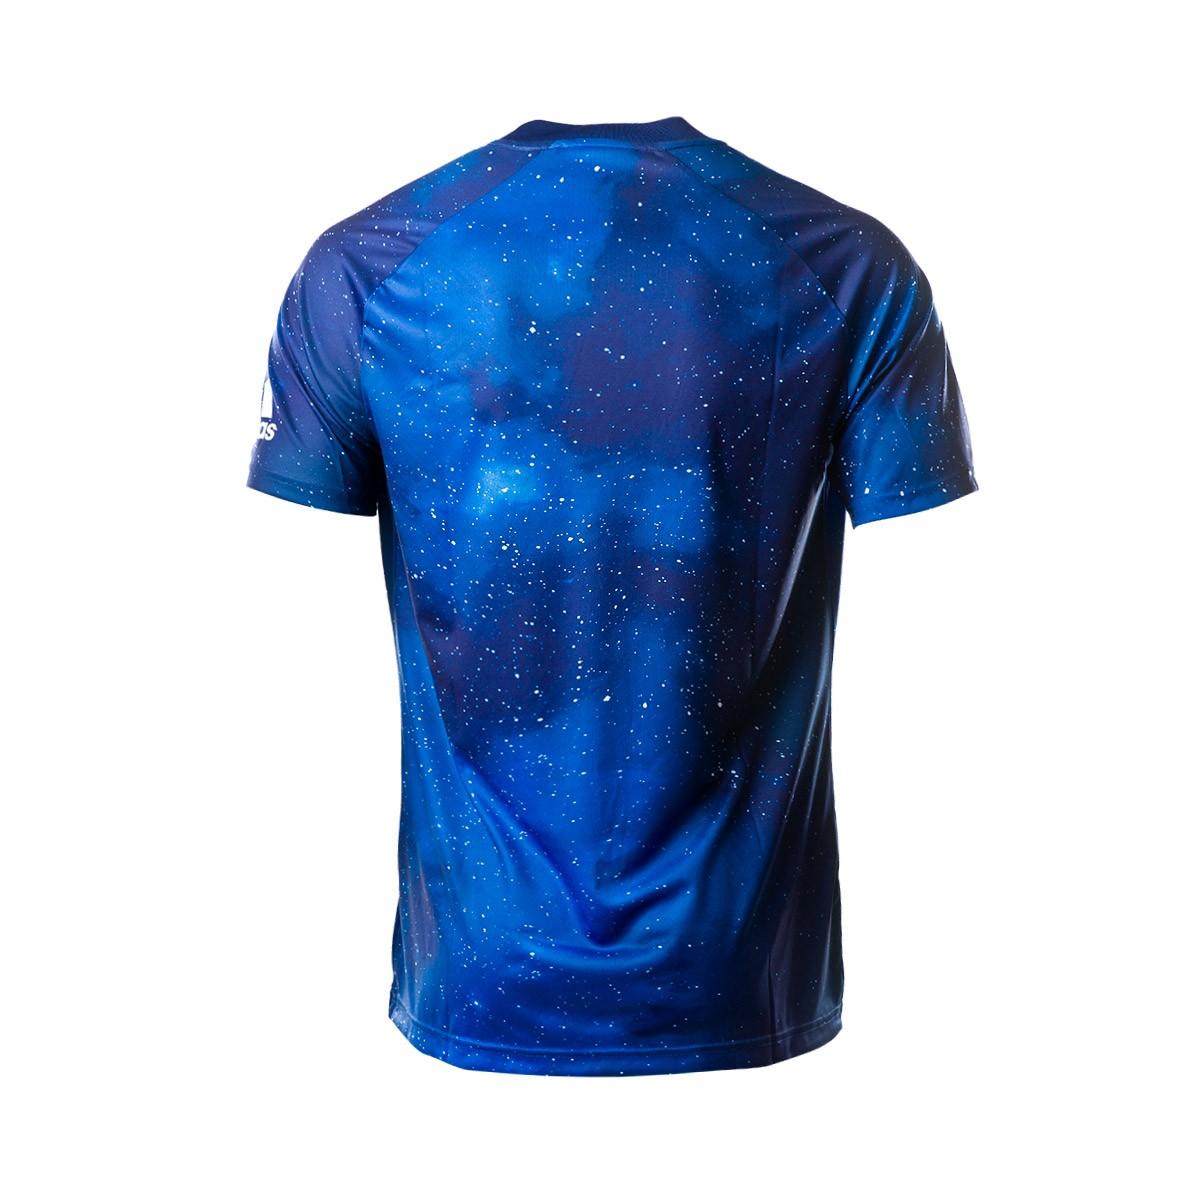 63e58c7ce9d8b Camiseta adidas Real Madrid EA 2018-2019 Azul - Tienda de fútbol Fútbol  Emotion